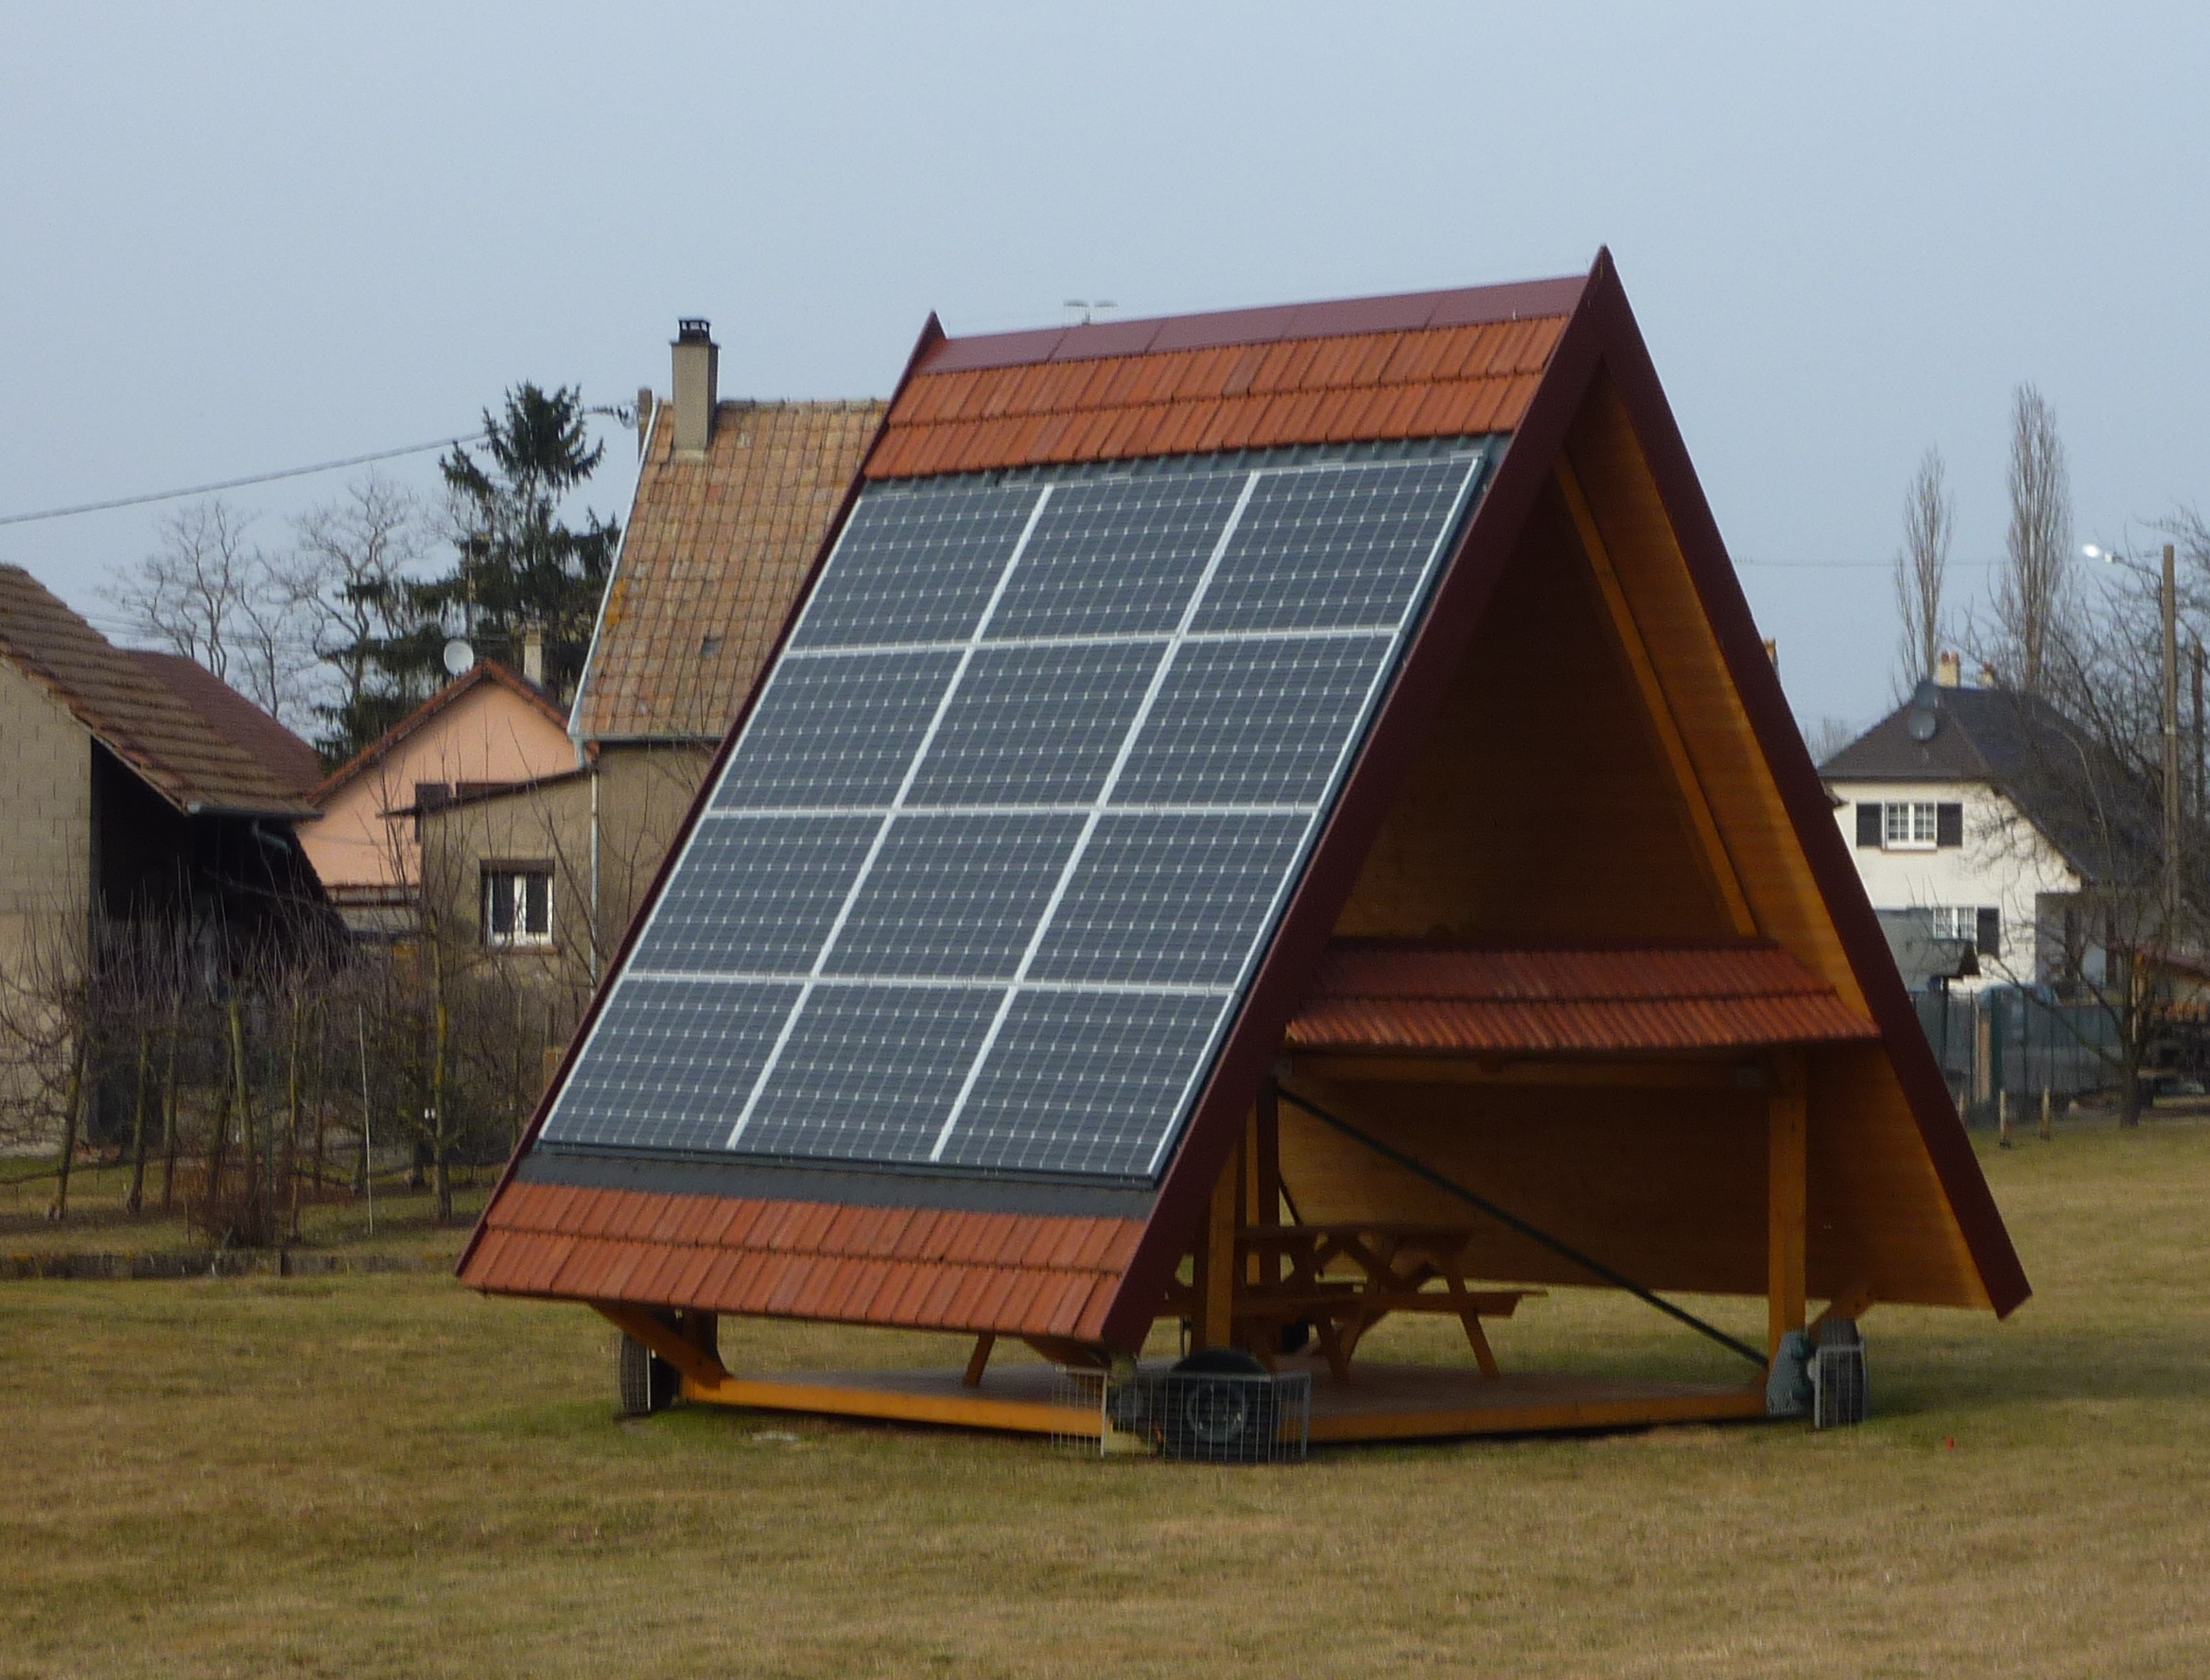 ruelisheim poursuite solaire velomaxou. Black Bedroom Furniture Sets. Home Design Ideas